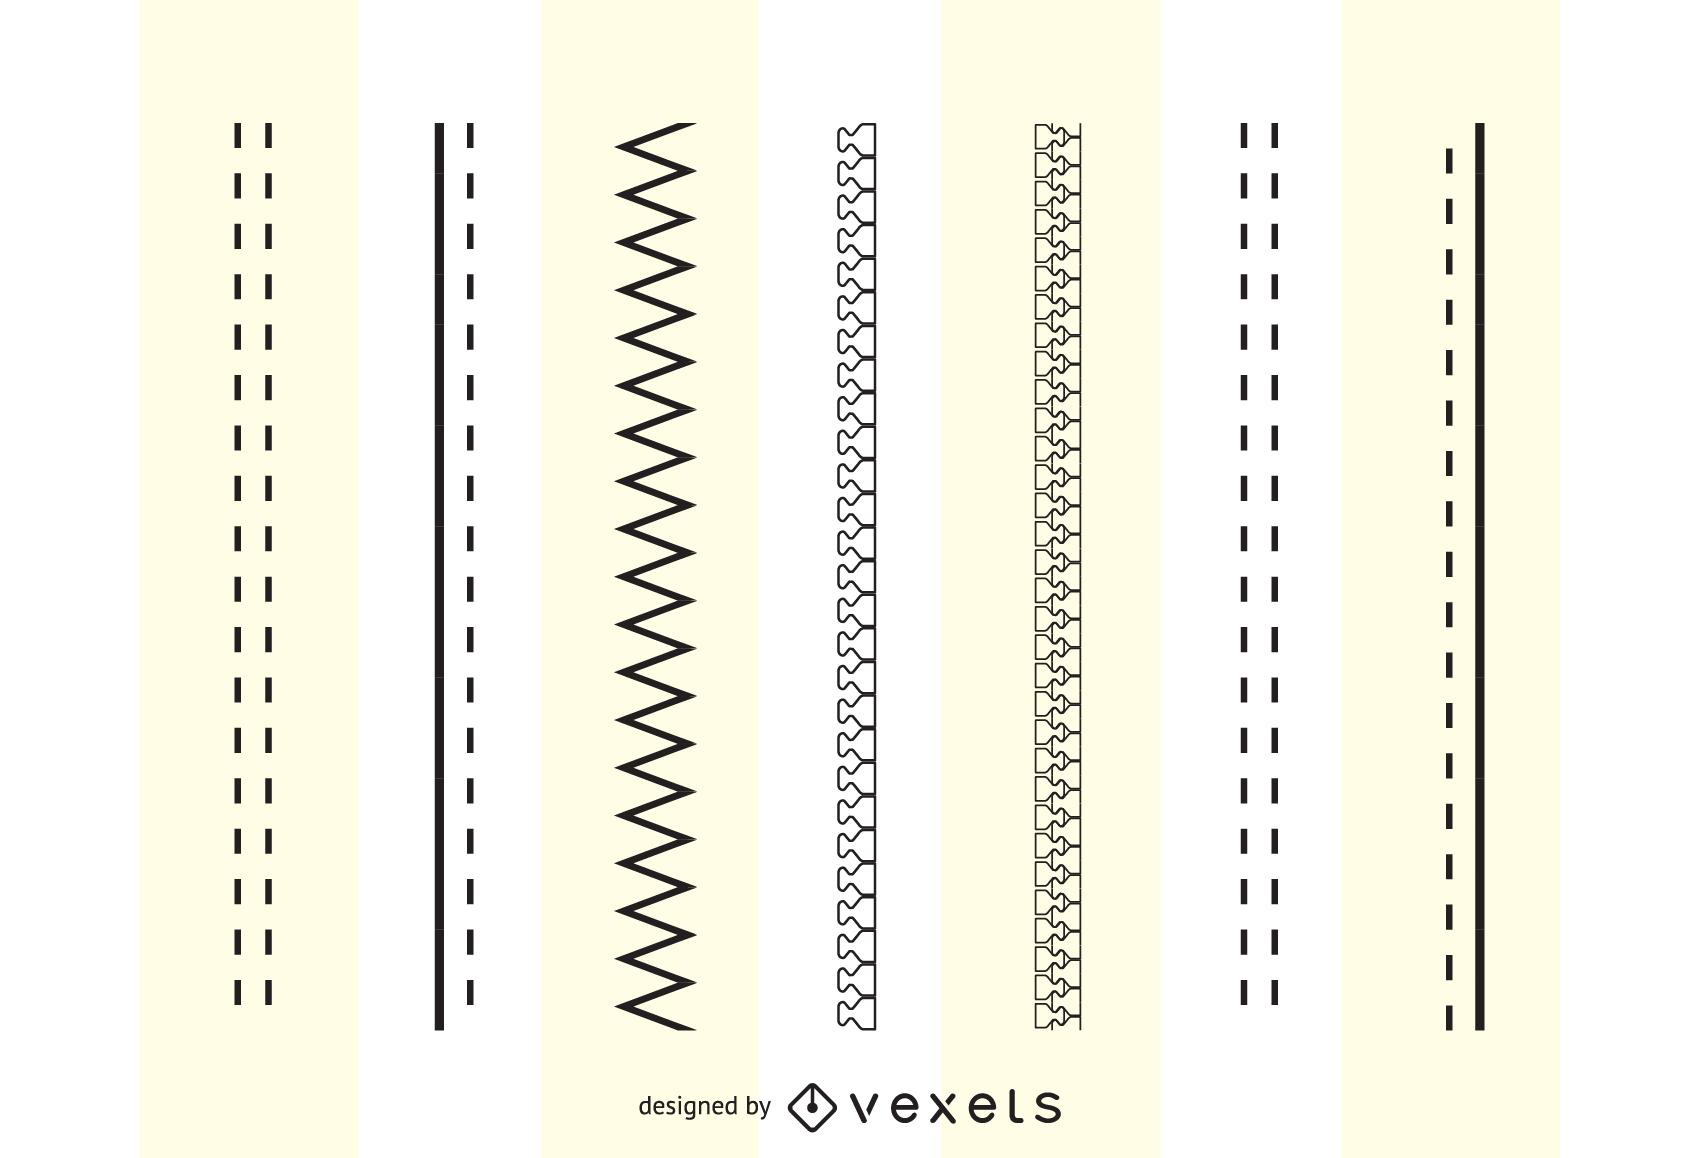 Fashion Design Brushes Zippers Stitching